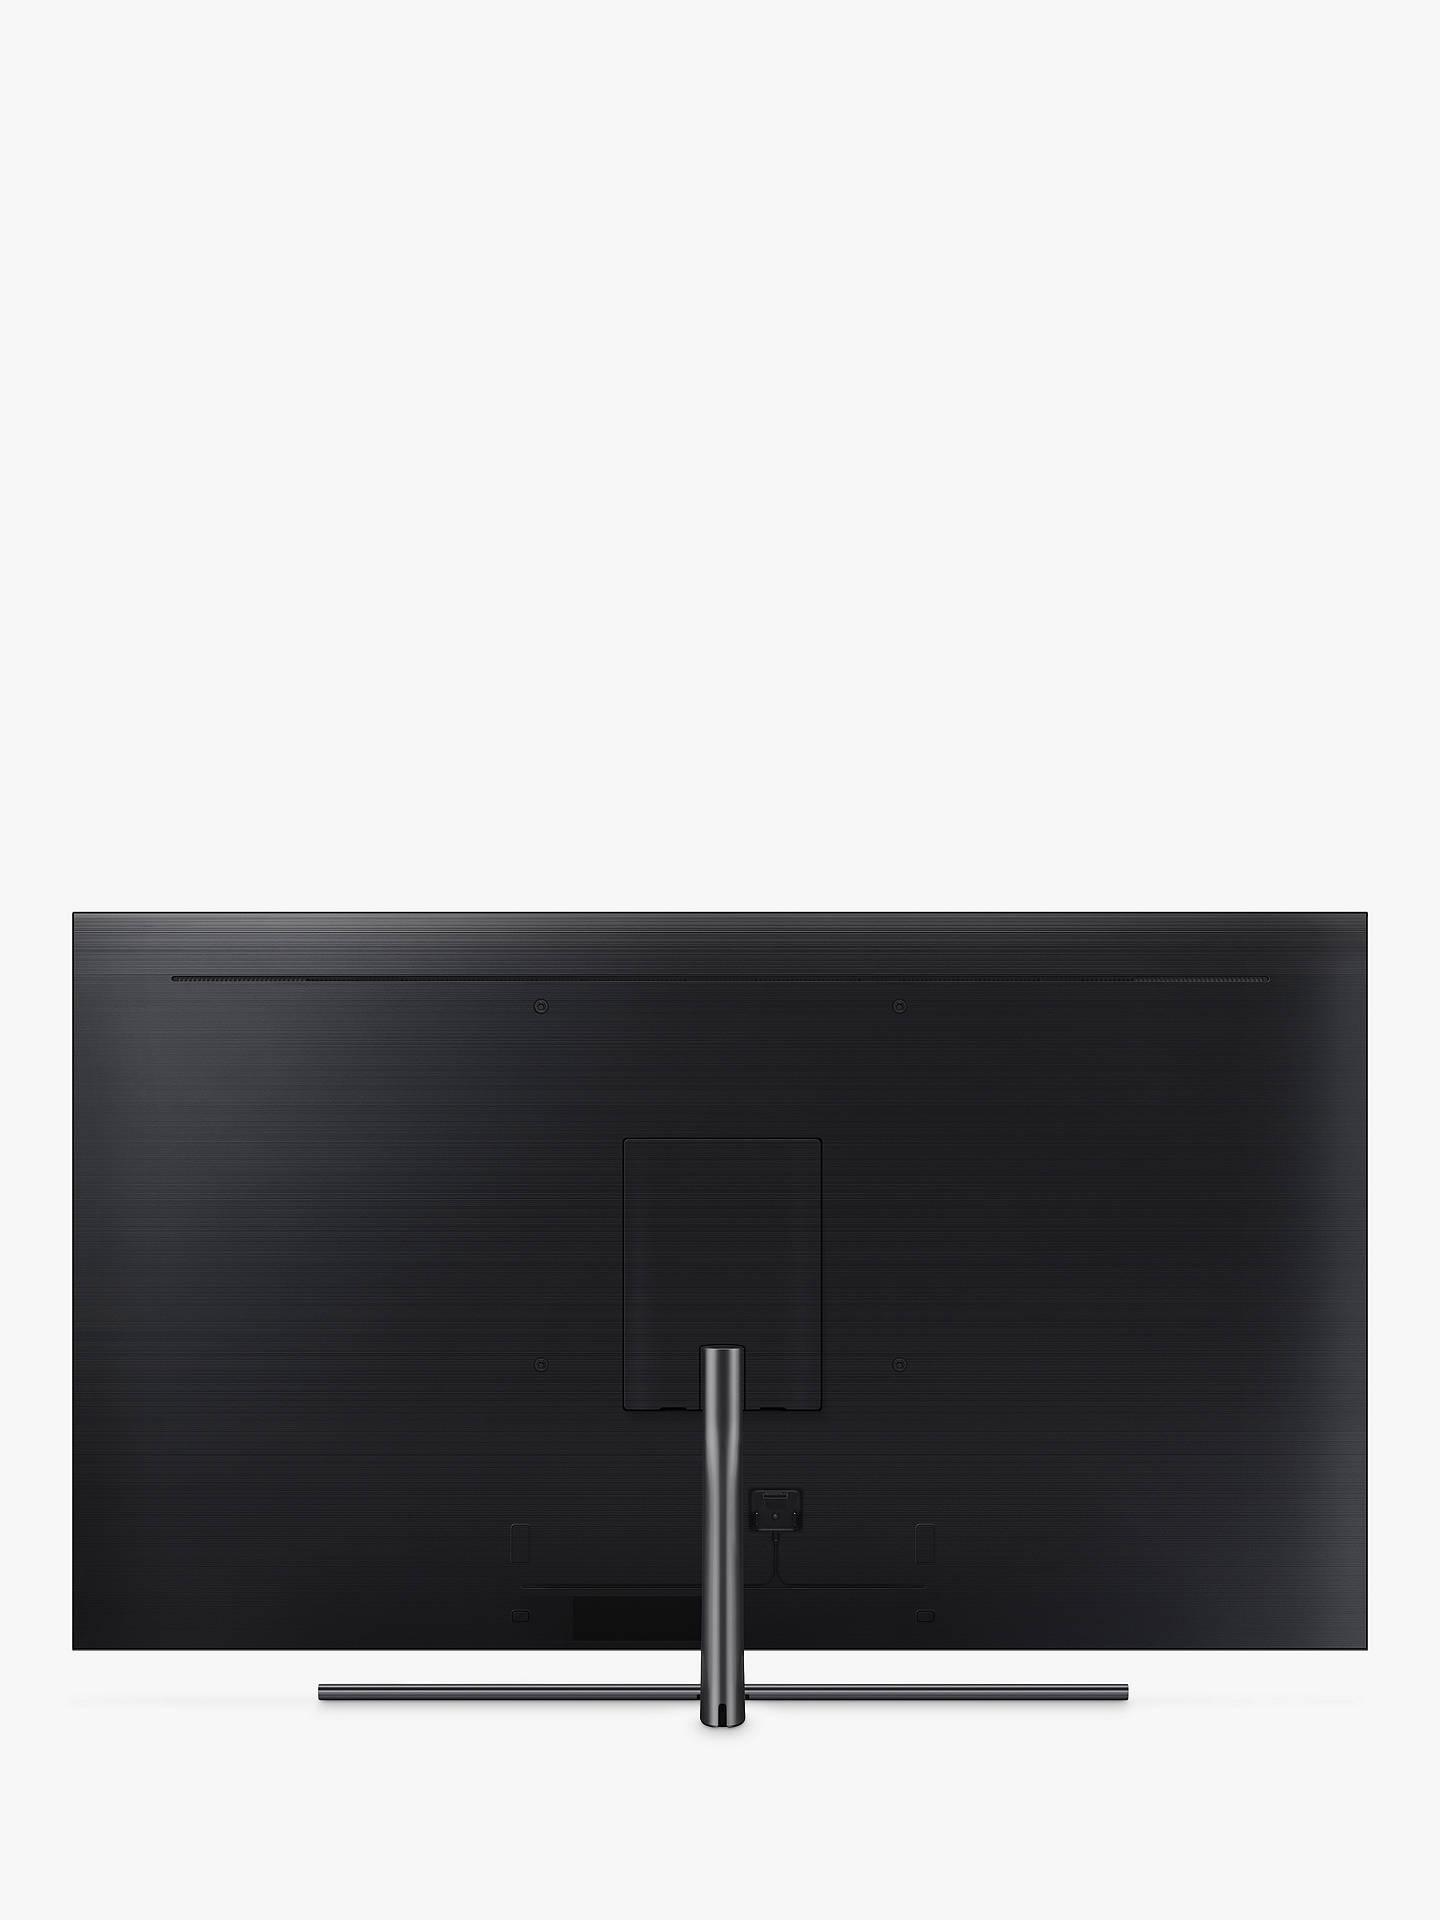 Samsung Qe65q9fn 2018 Qled Hdr 2000 4k Ultra Hd Smart Tv 65 With